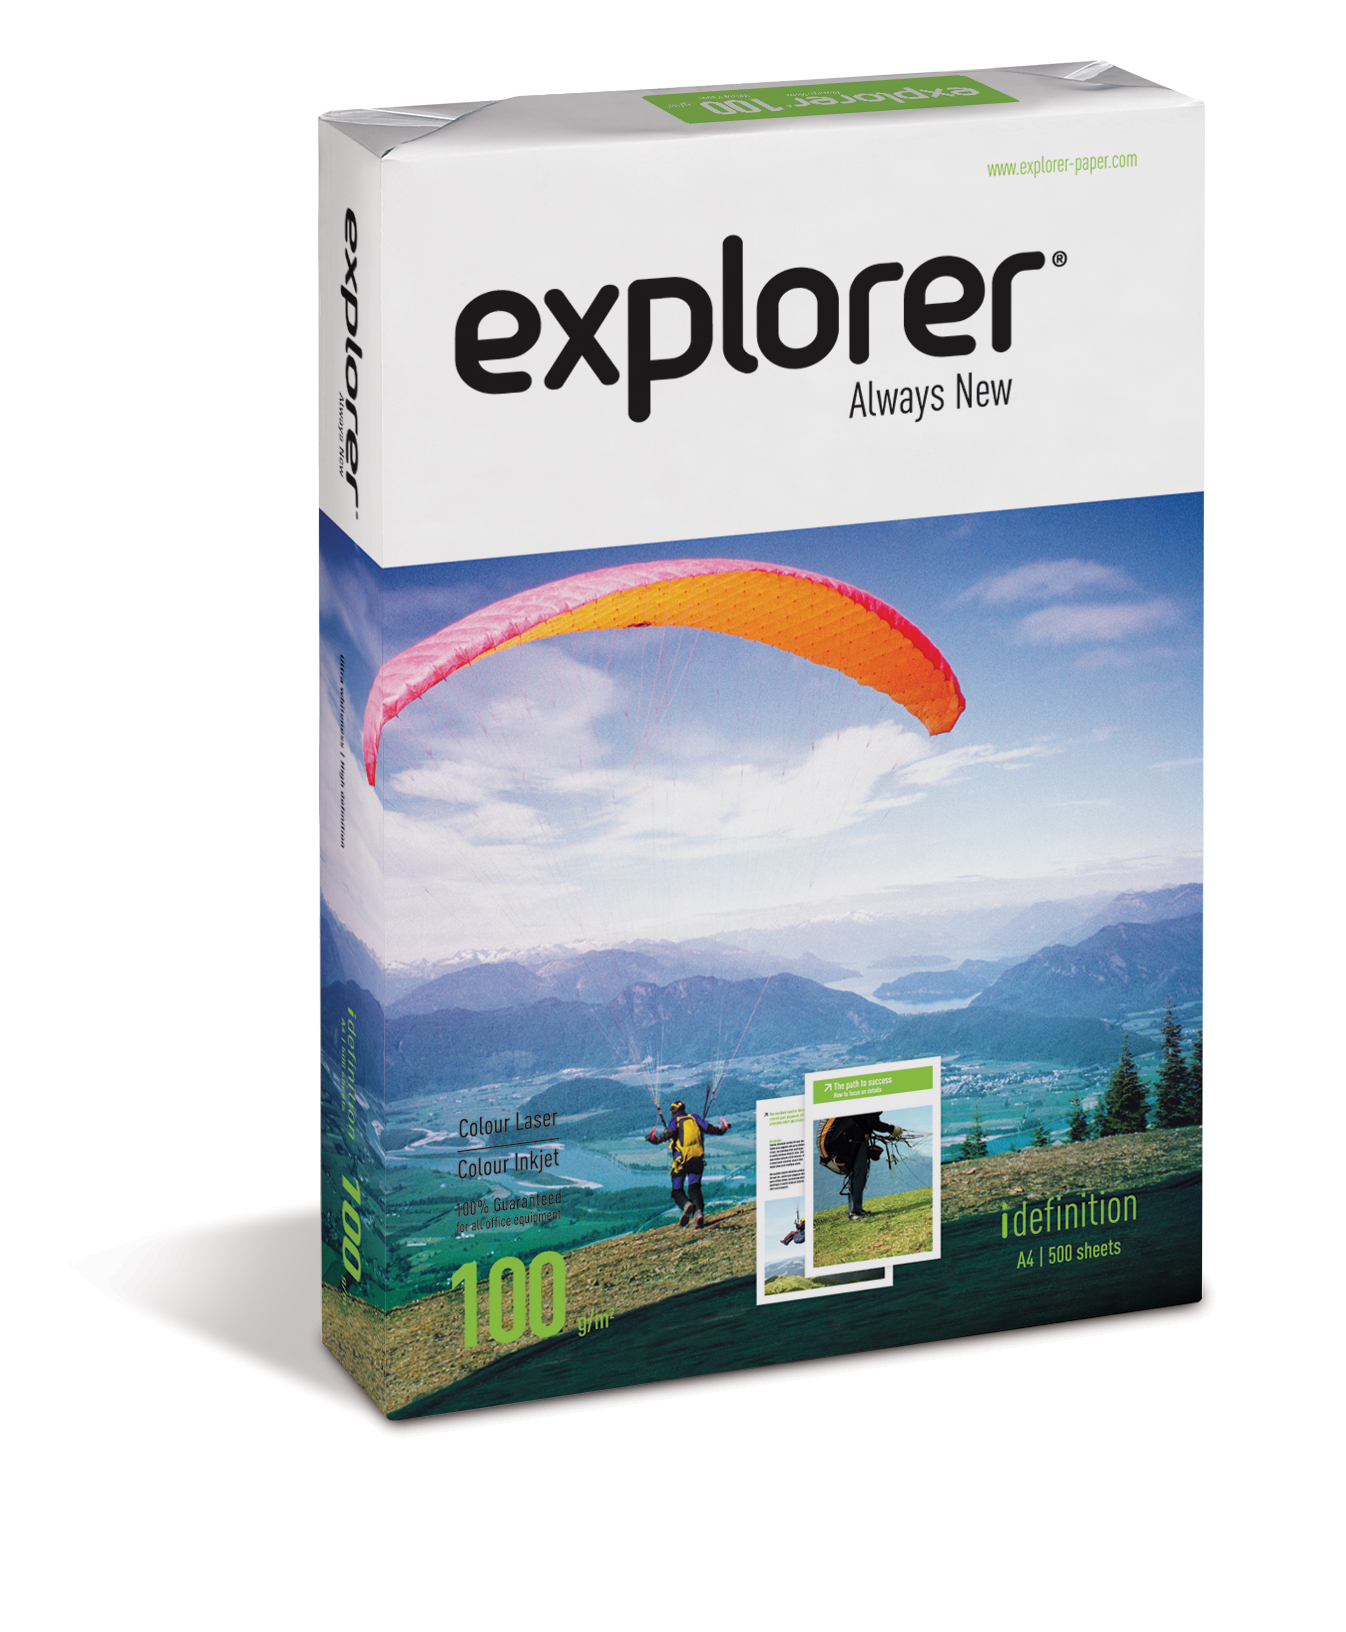 Vorschau: Explorer Always New 100g/m² Papier DIN-A4 - 500 Blatt weiß